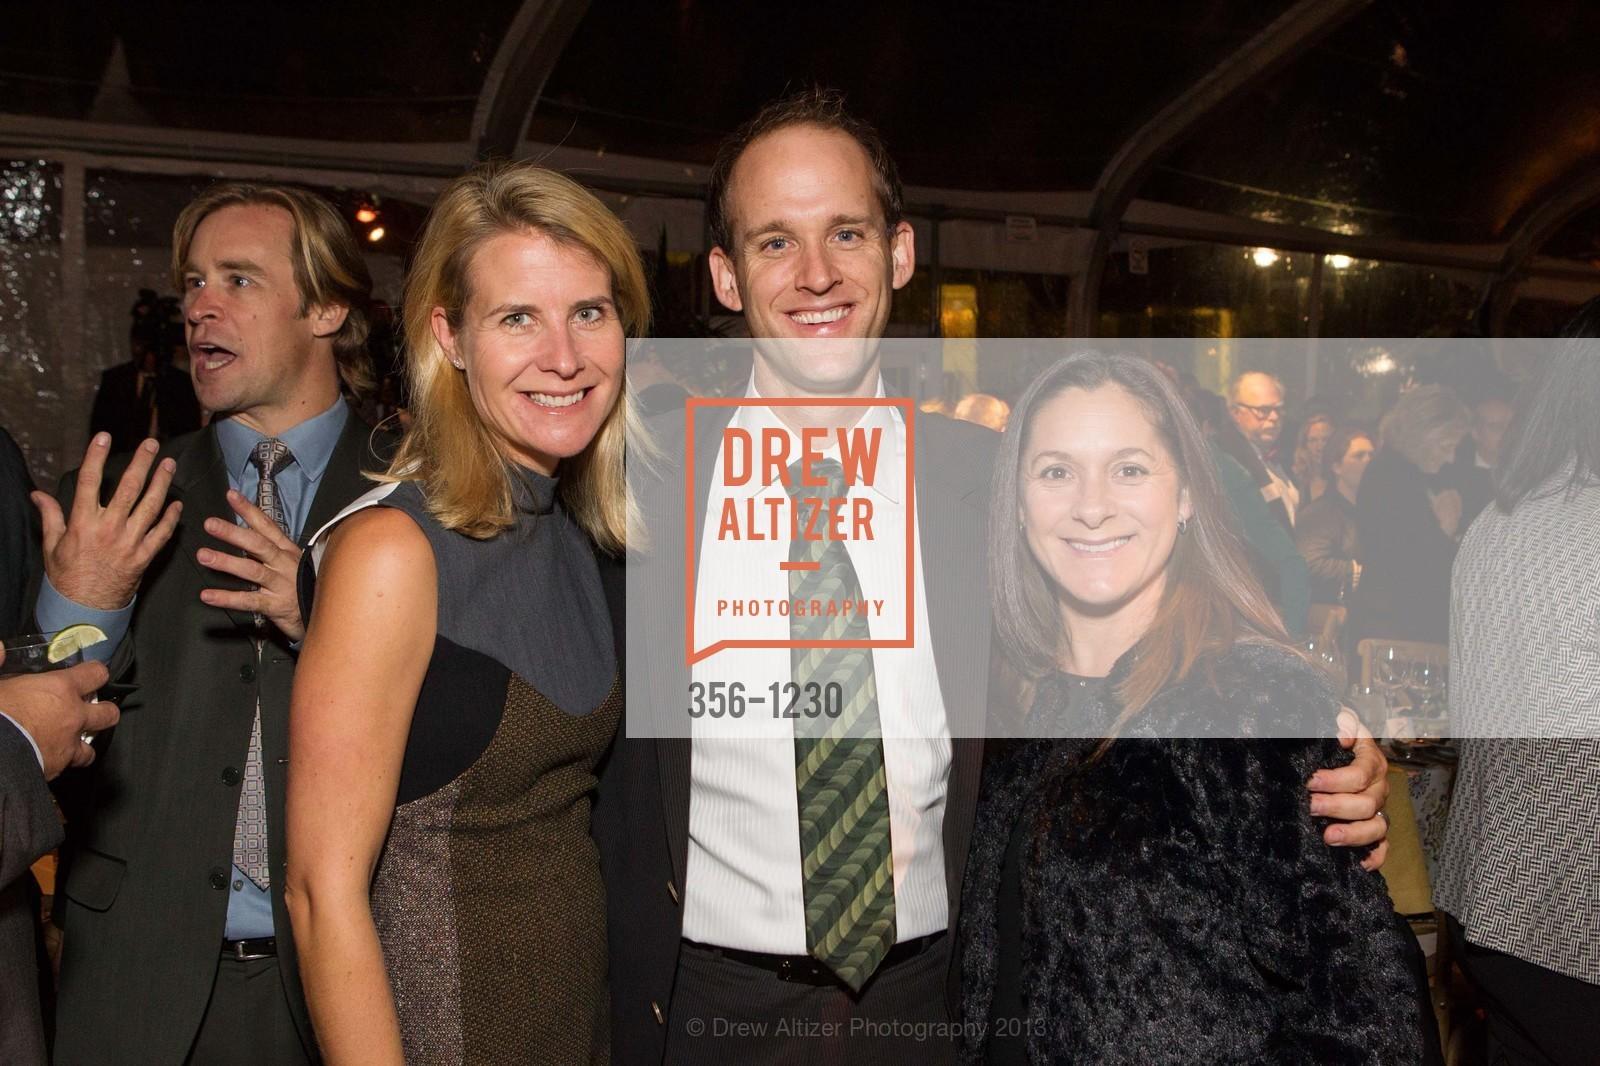 Catarina Schwab, Corey Cook, Yvette Mere-Cook, Photo #356-1230